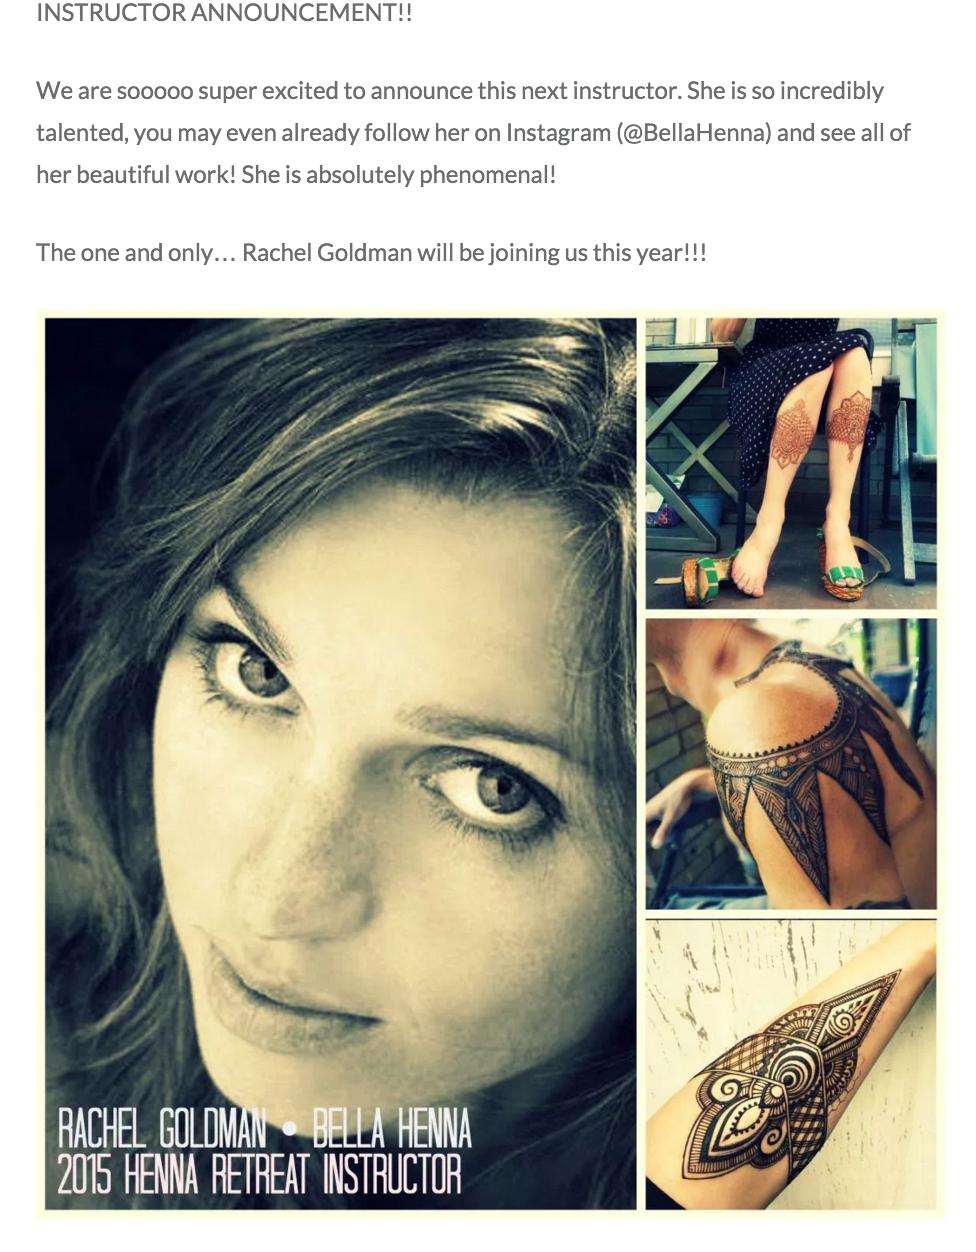 BellaHenna-Rachel-Goldman-HennaIntensive-2015